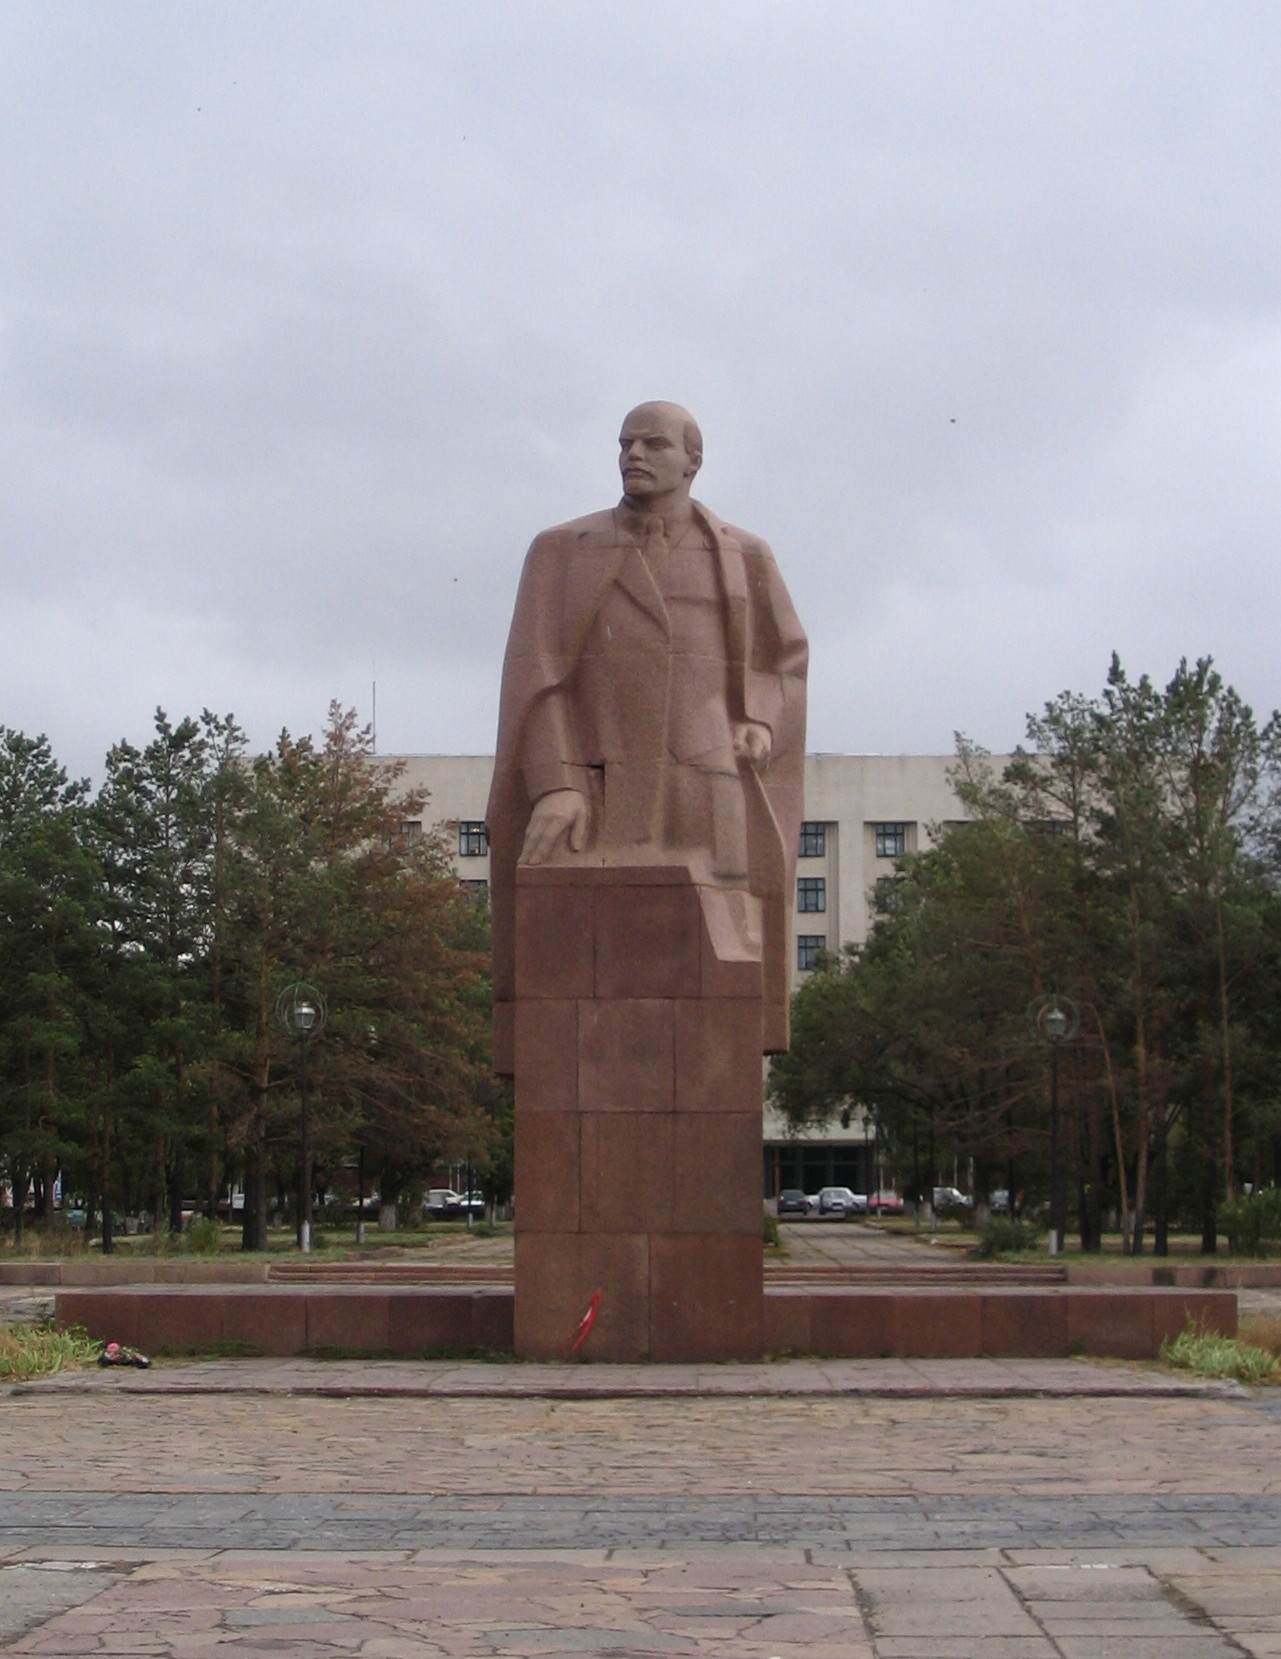 Авторынок камень на оби, бесплатные ...: pictures11.ru/avtorynok-kamen-na-obi.html